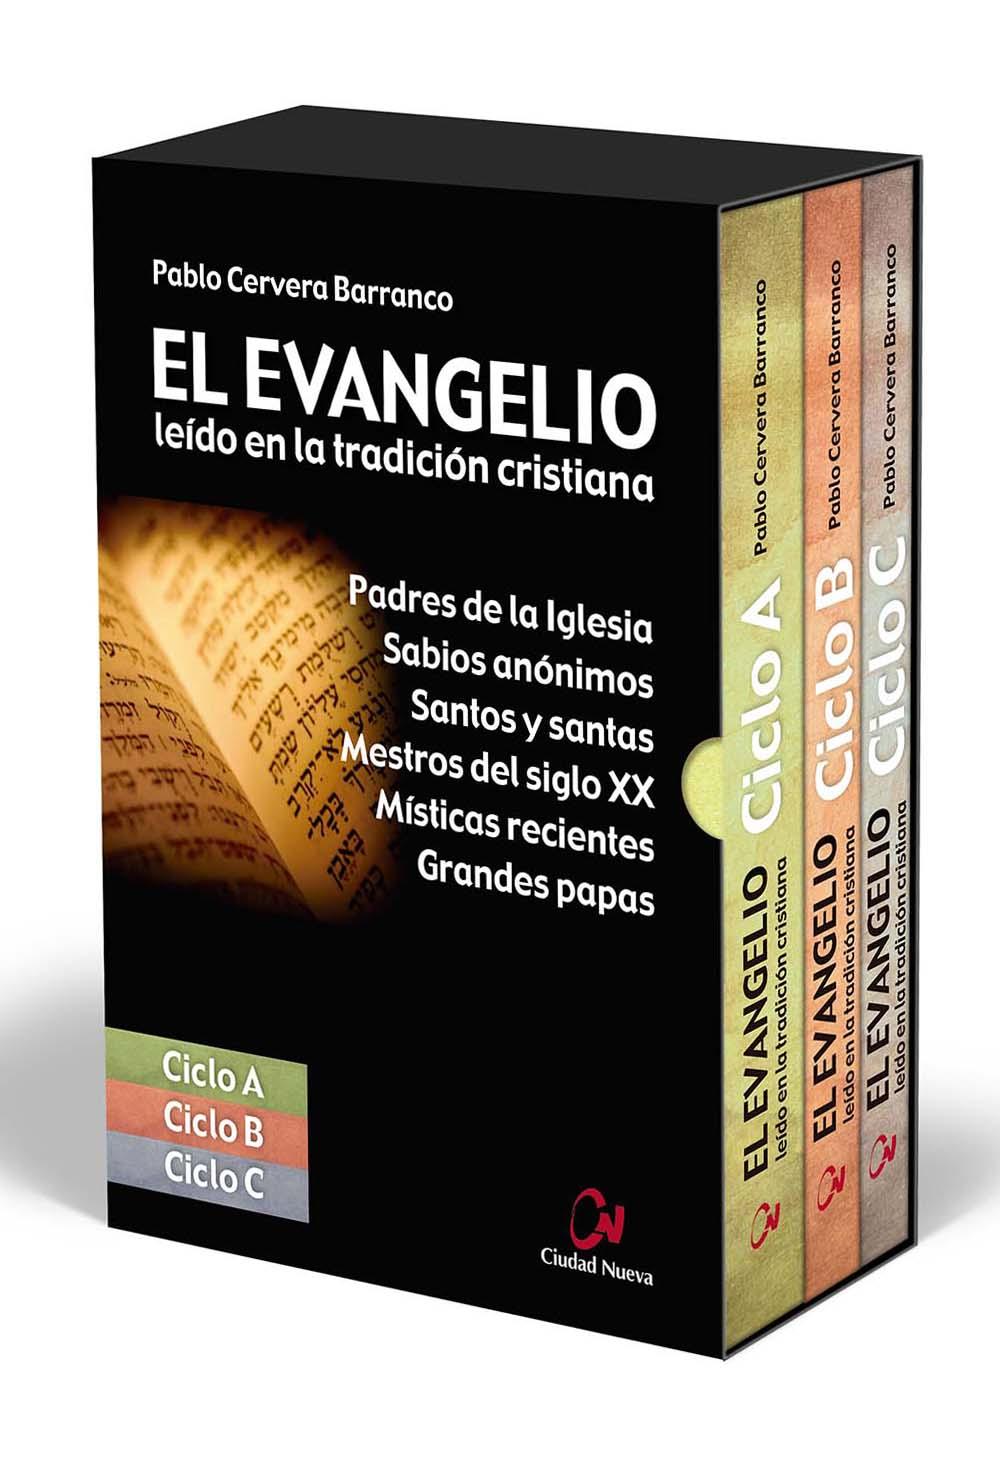 estuche-trilogia-evangelio-leido-en-la-tradicion-cristiana